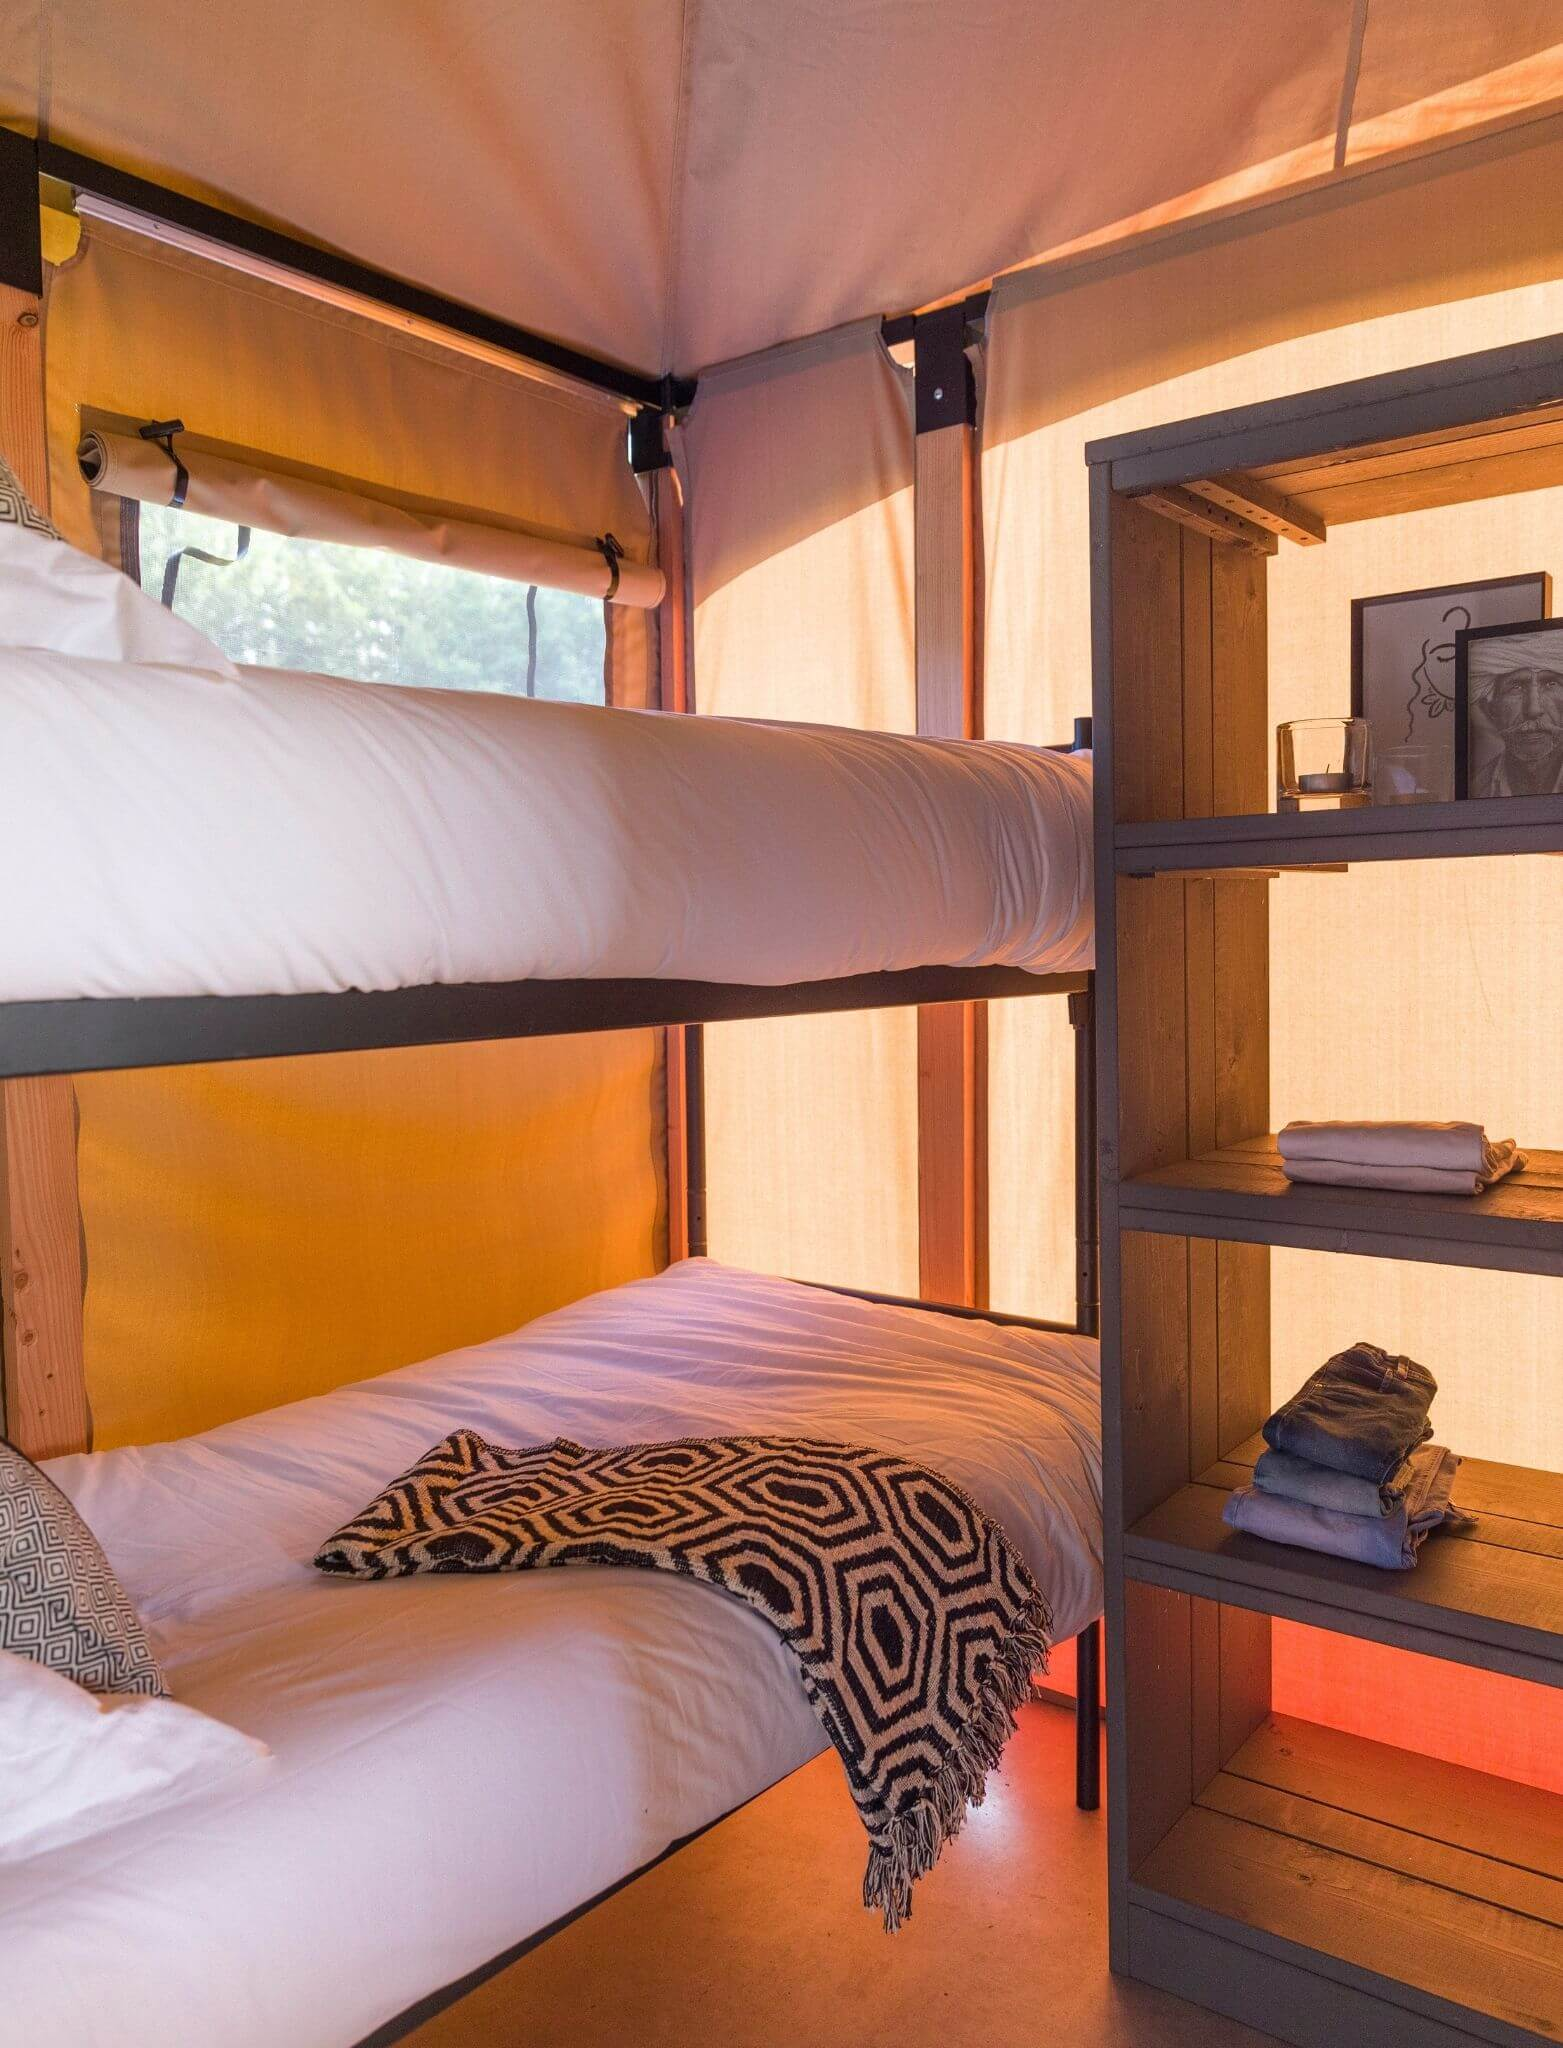 YALA_safari_tent_bedroom with bunkbed_interior_Pure